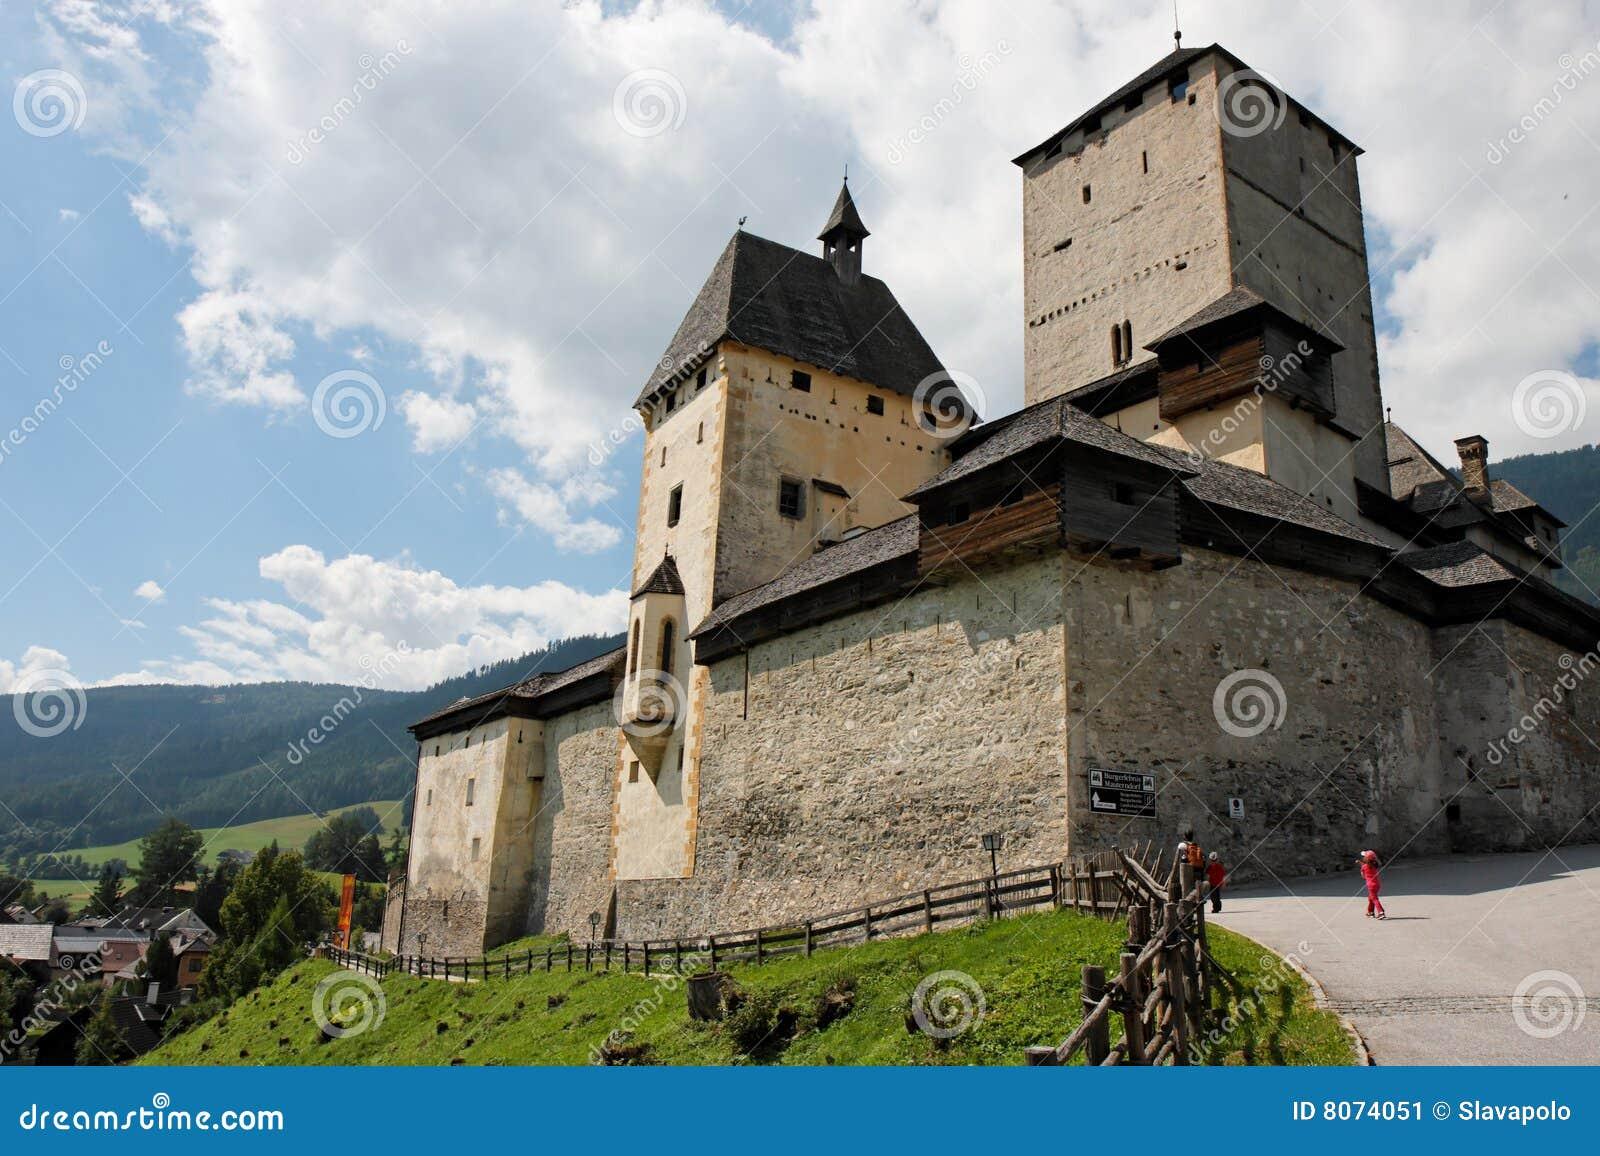 Mauterndorf medieval castle in Austria